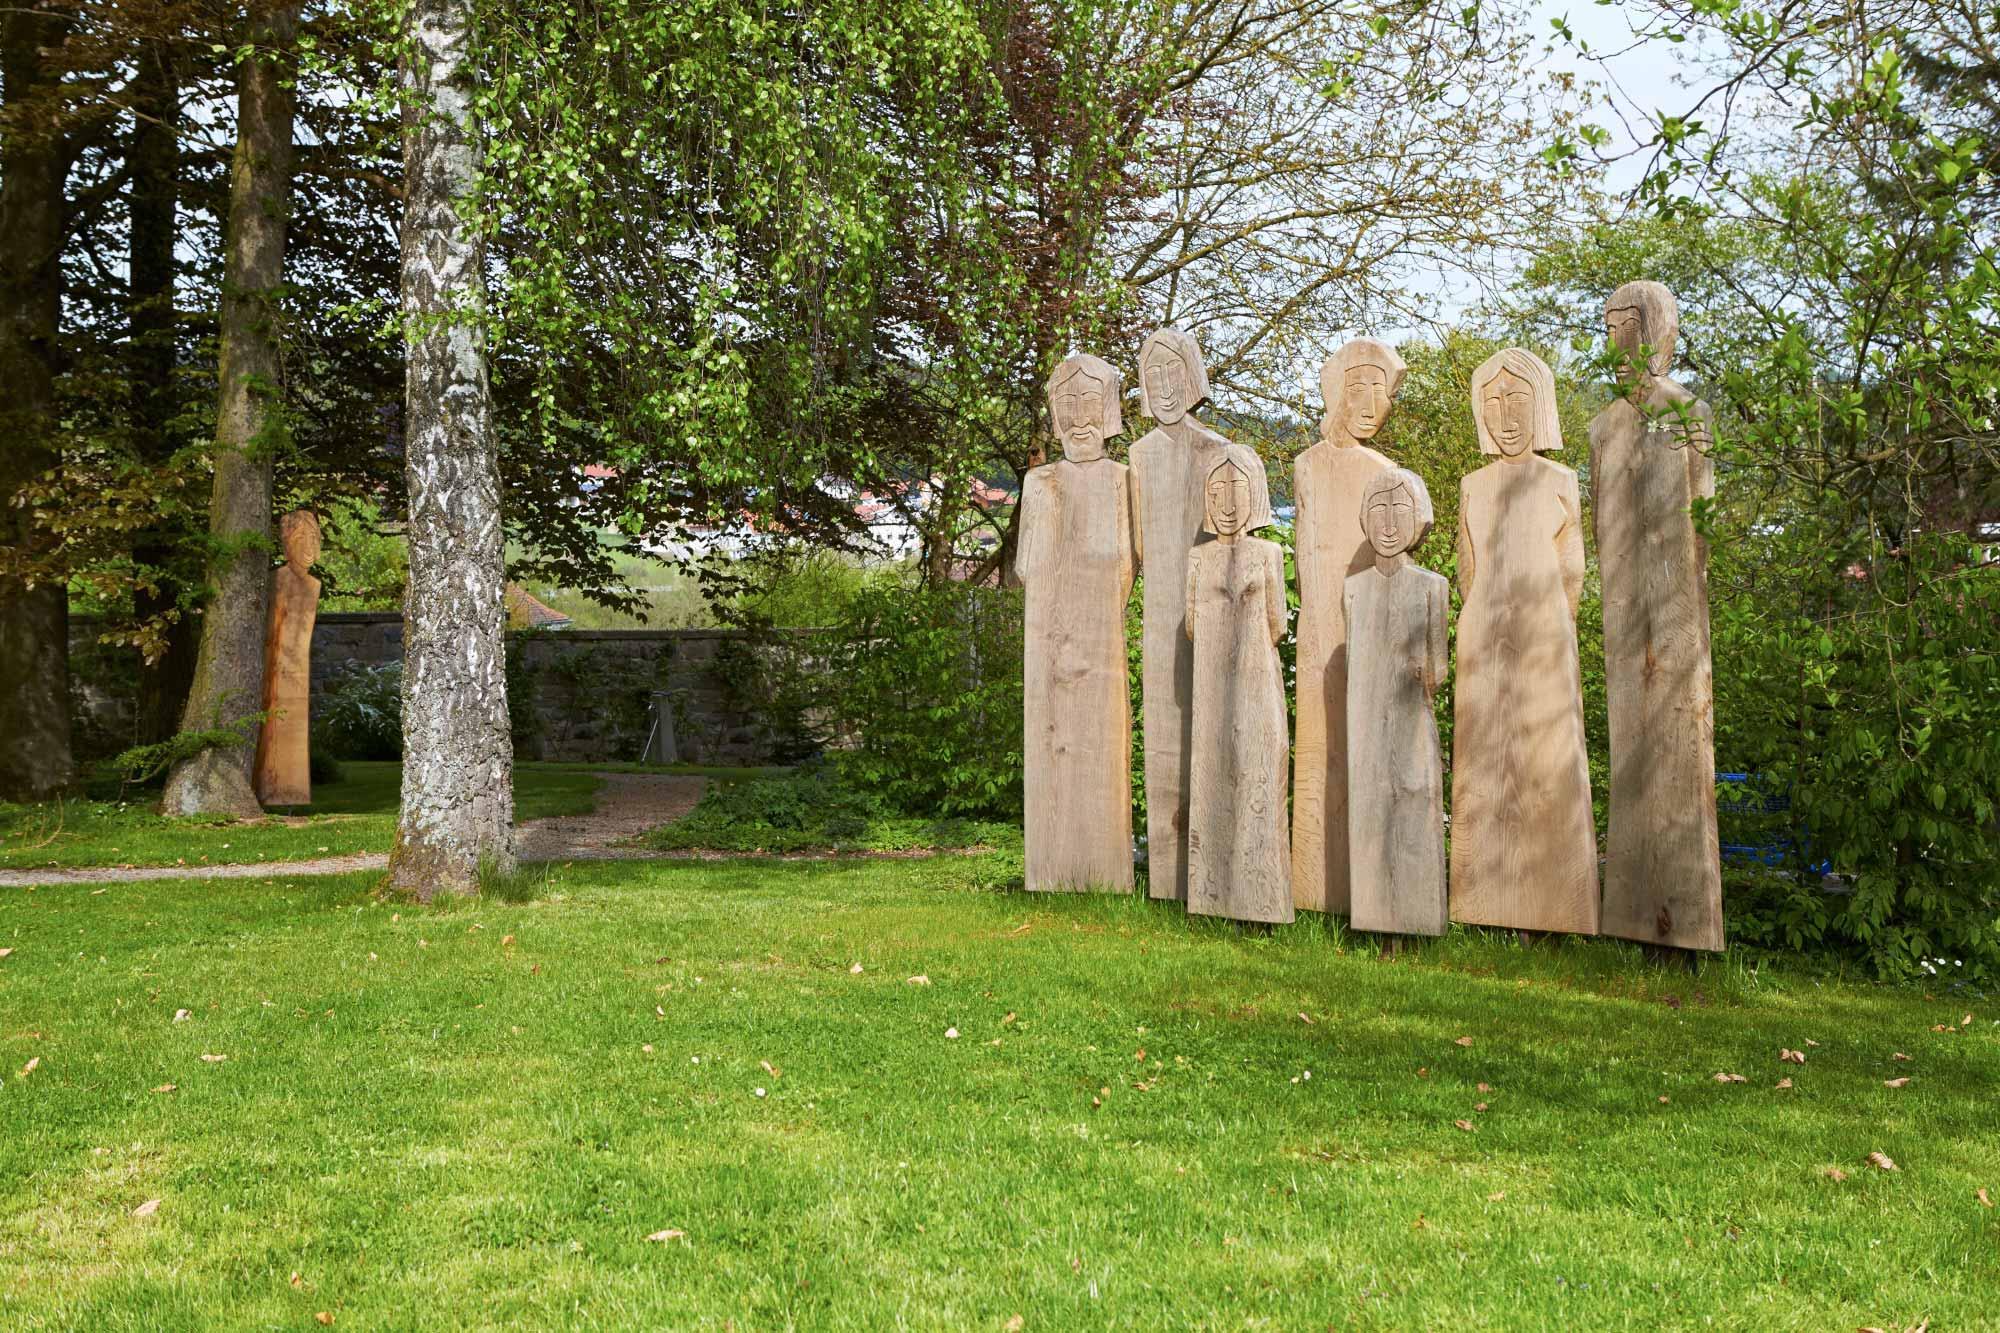 aktuelles - benediktinerinnen der anbetung kloster st. scholastika, Garten Ideen